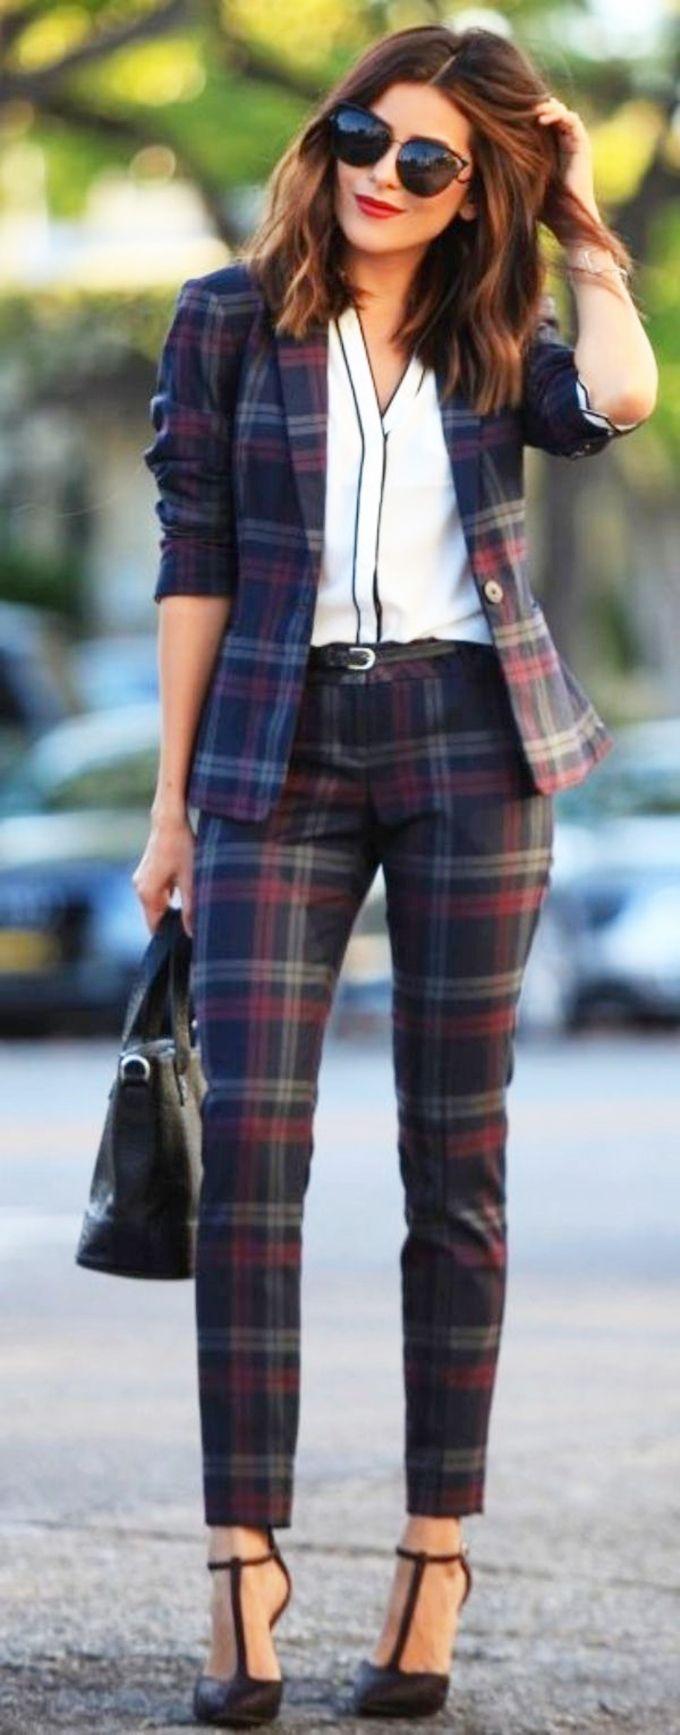 Channel disney dress up stylish sporty